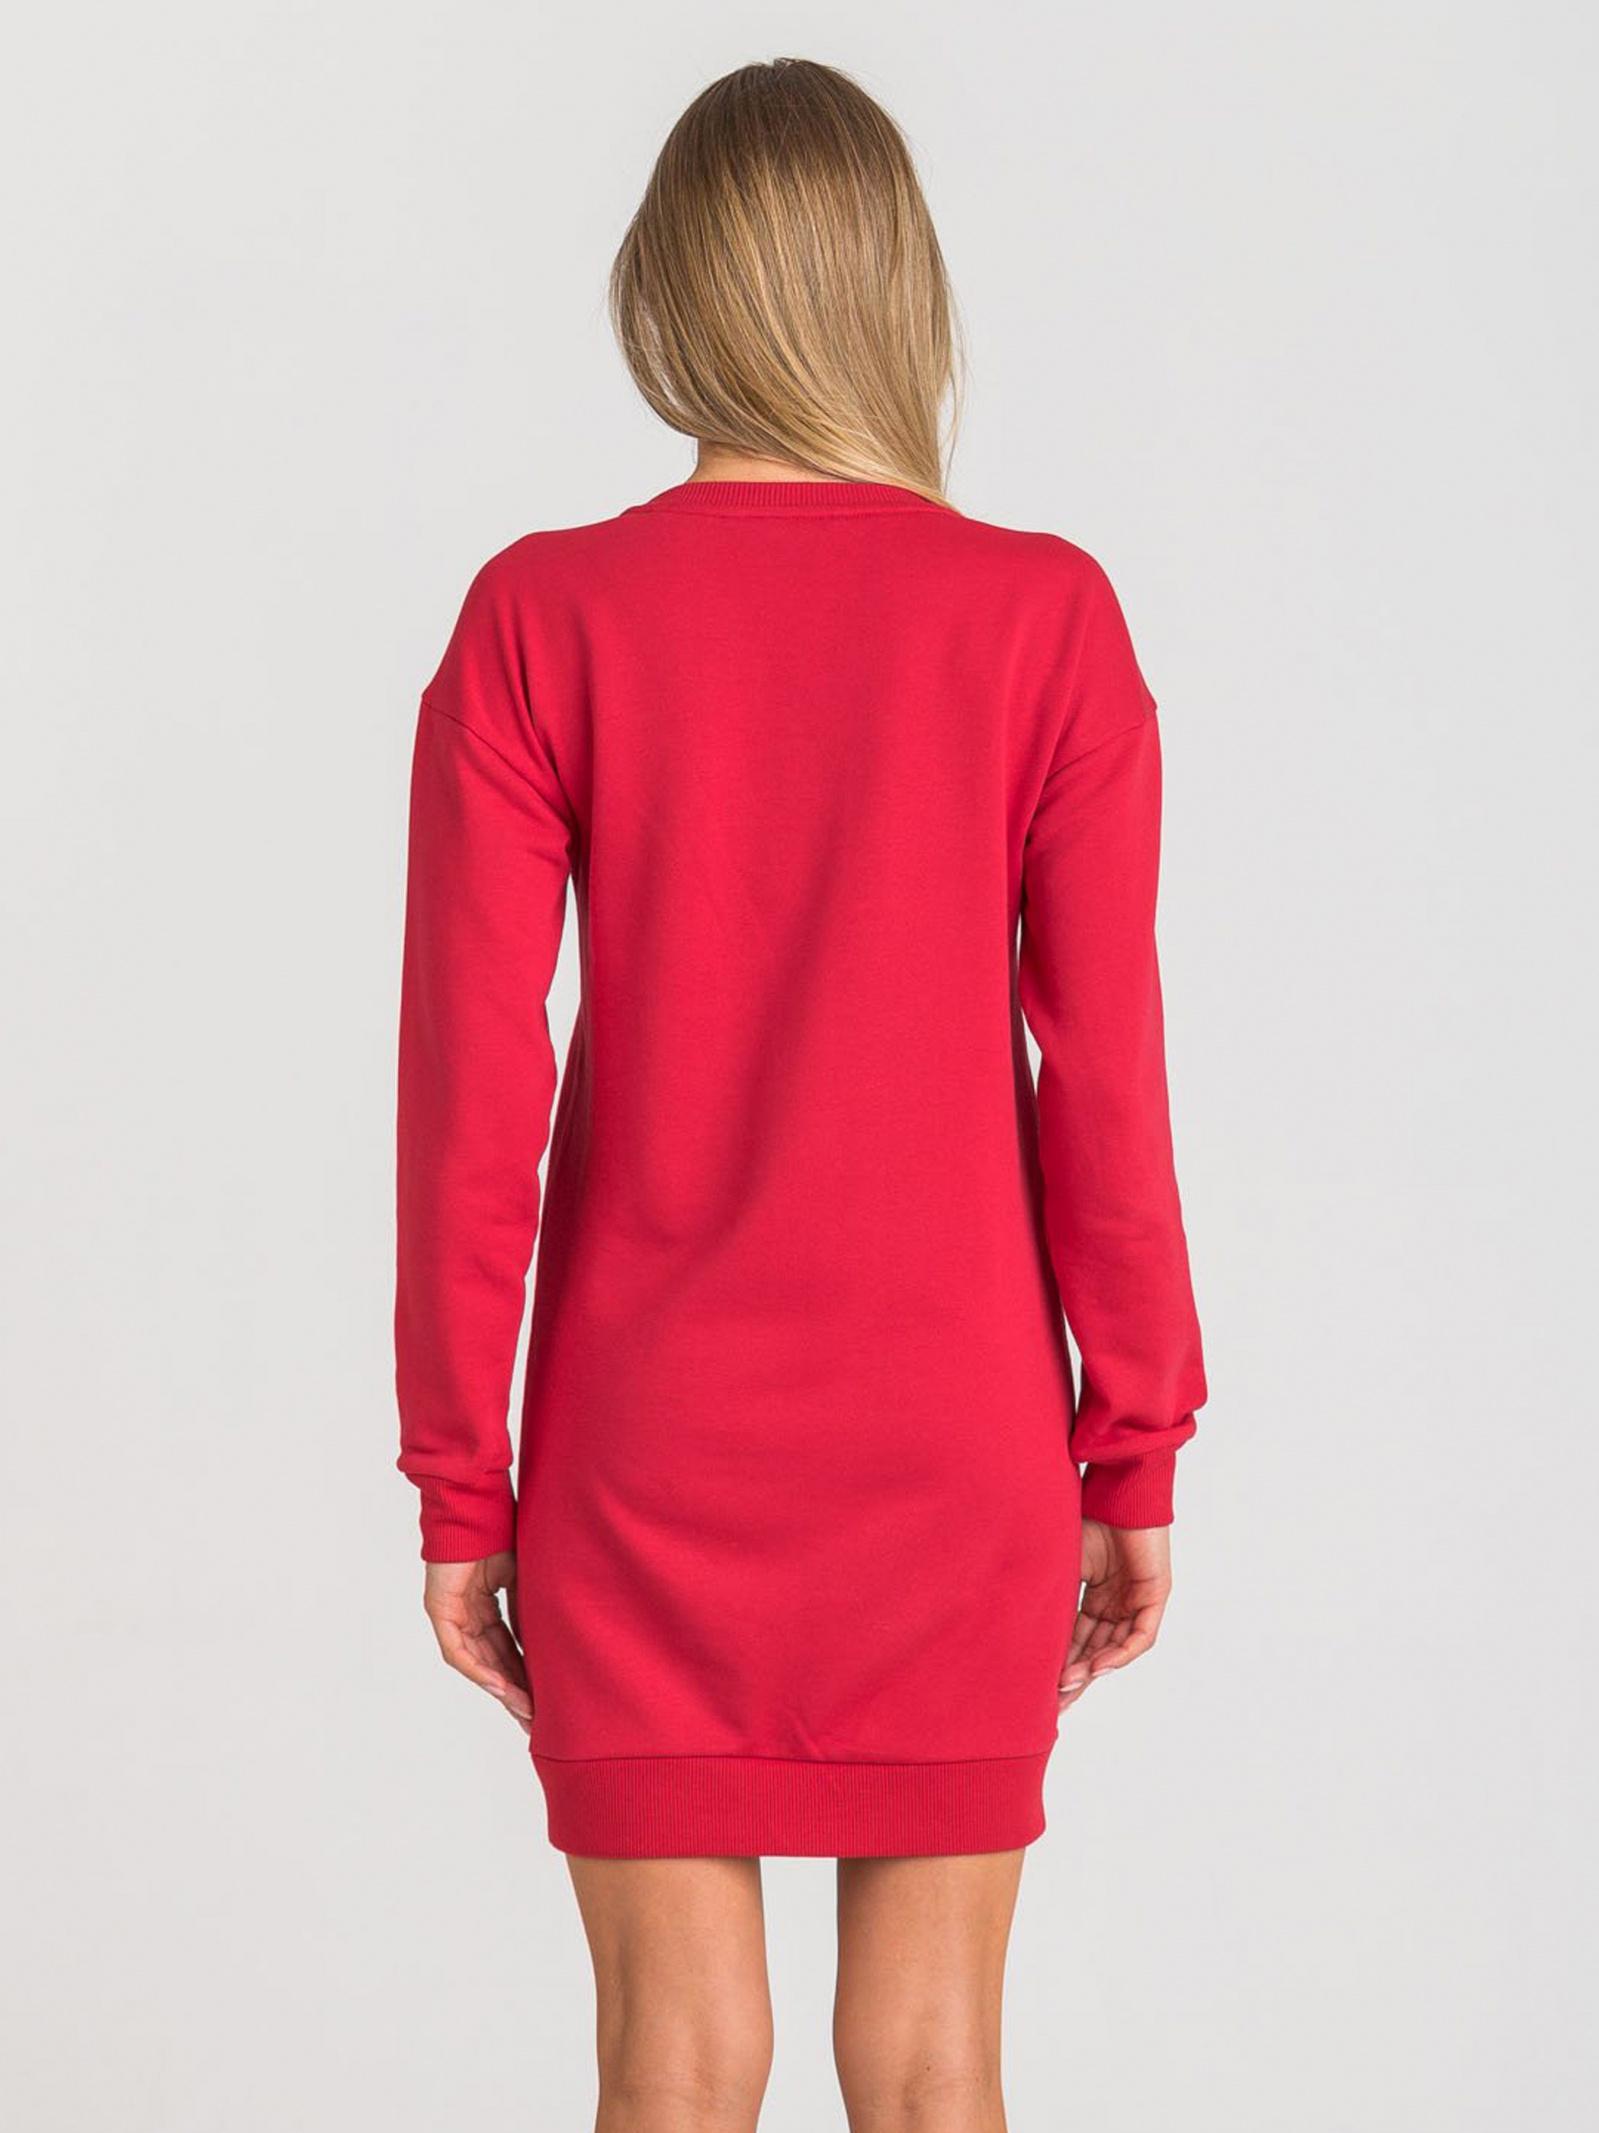 Платье женские Armani Exchange модель QZ2045 цена, 2017